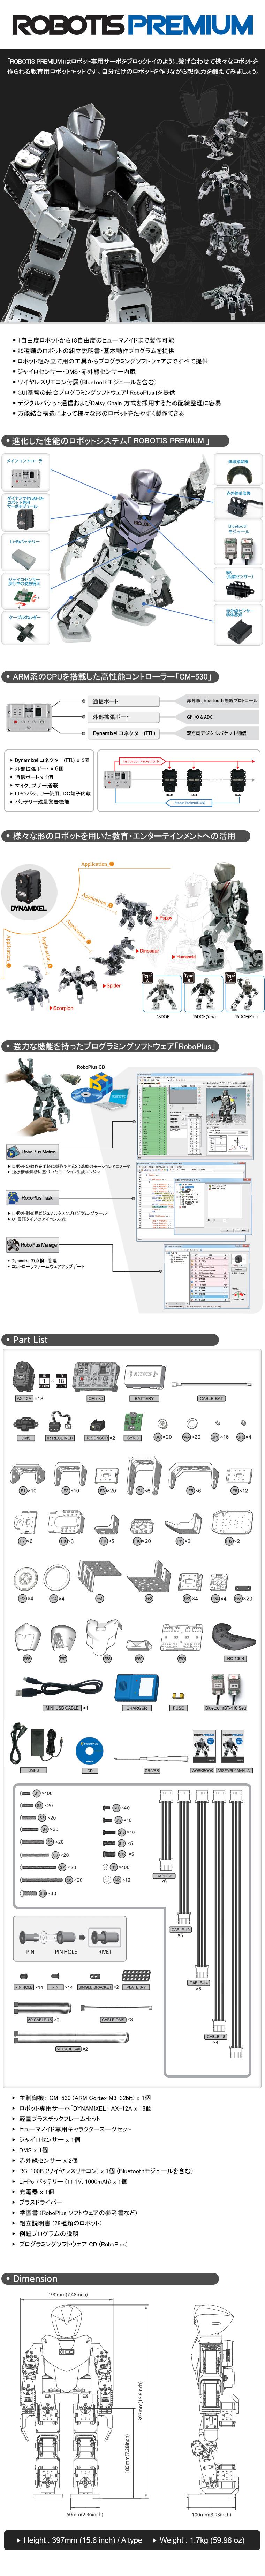 ROBOTIS_PREMIUM_JP_info_ver1642.jpg